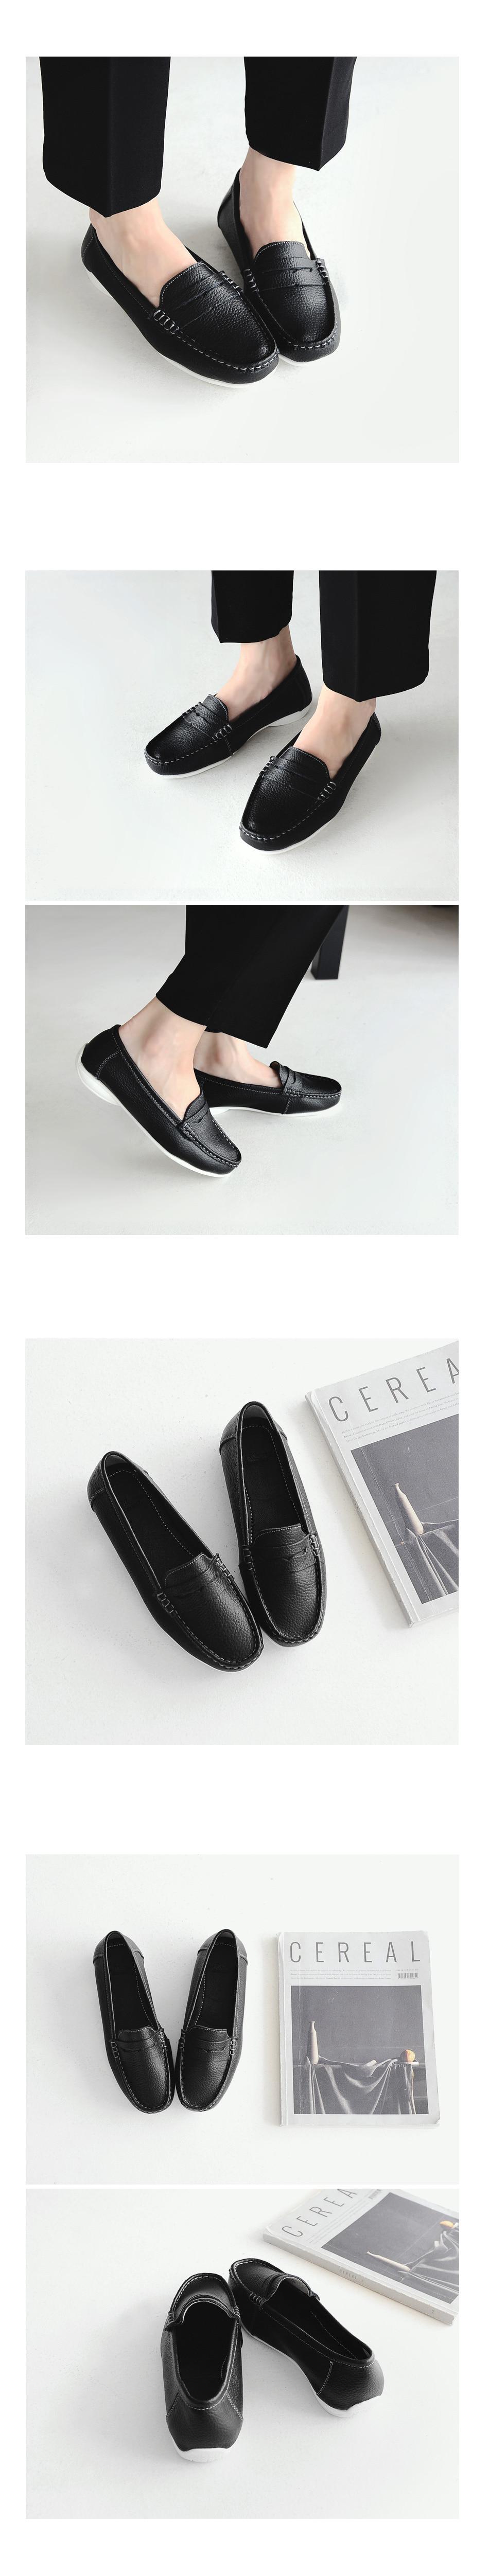 Javelon Loafers 3cm